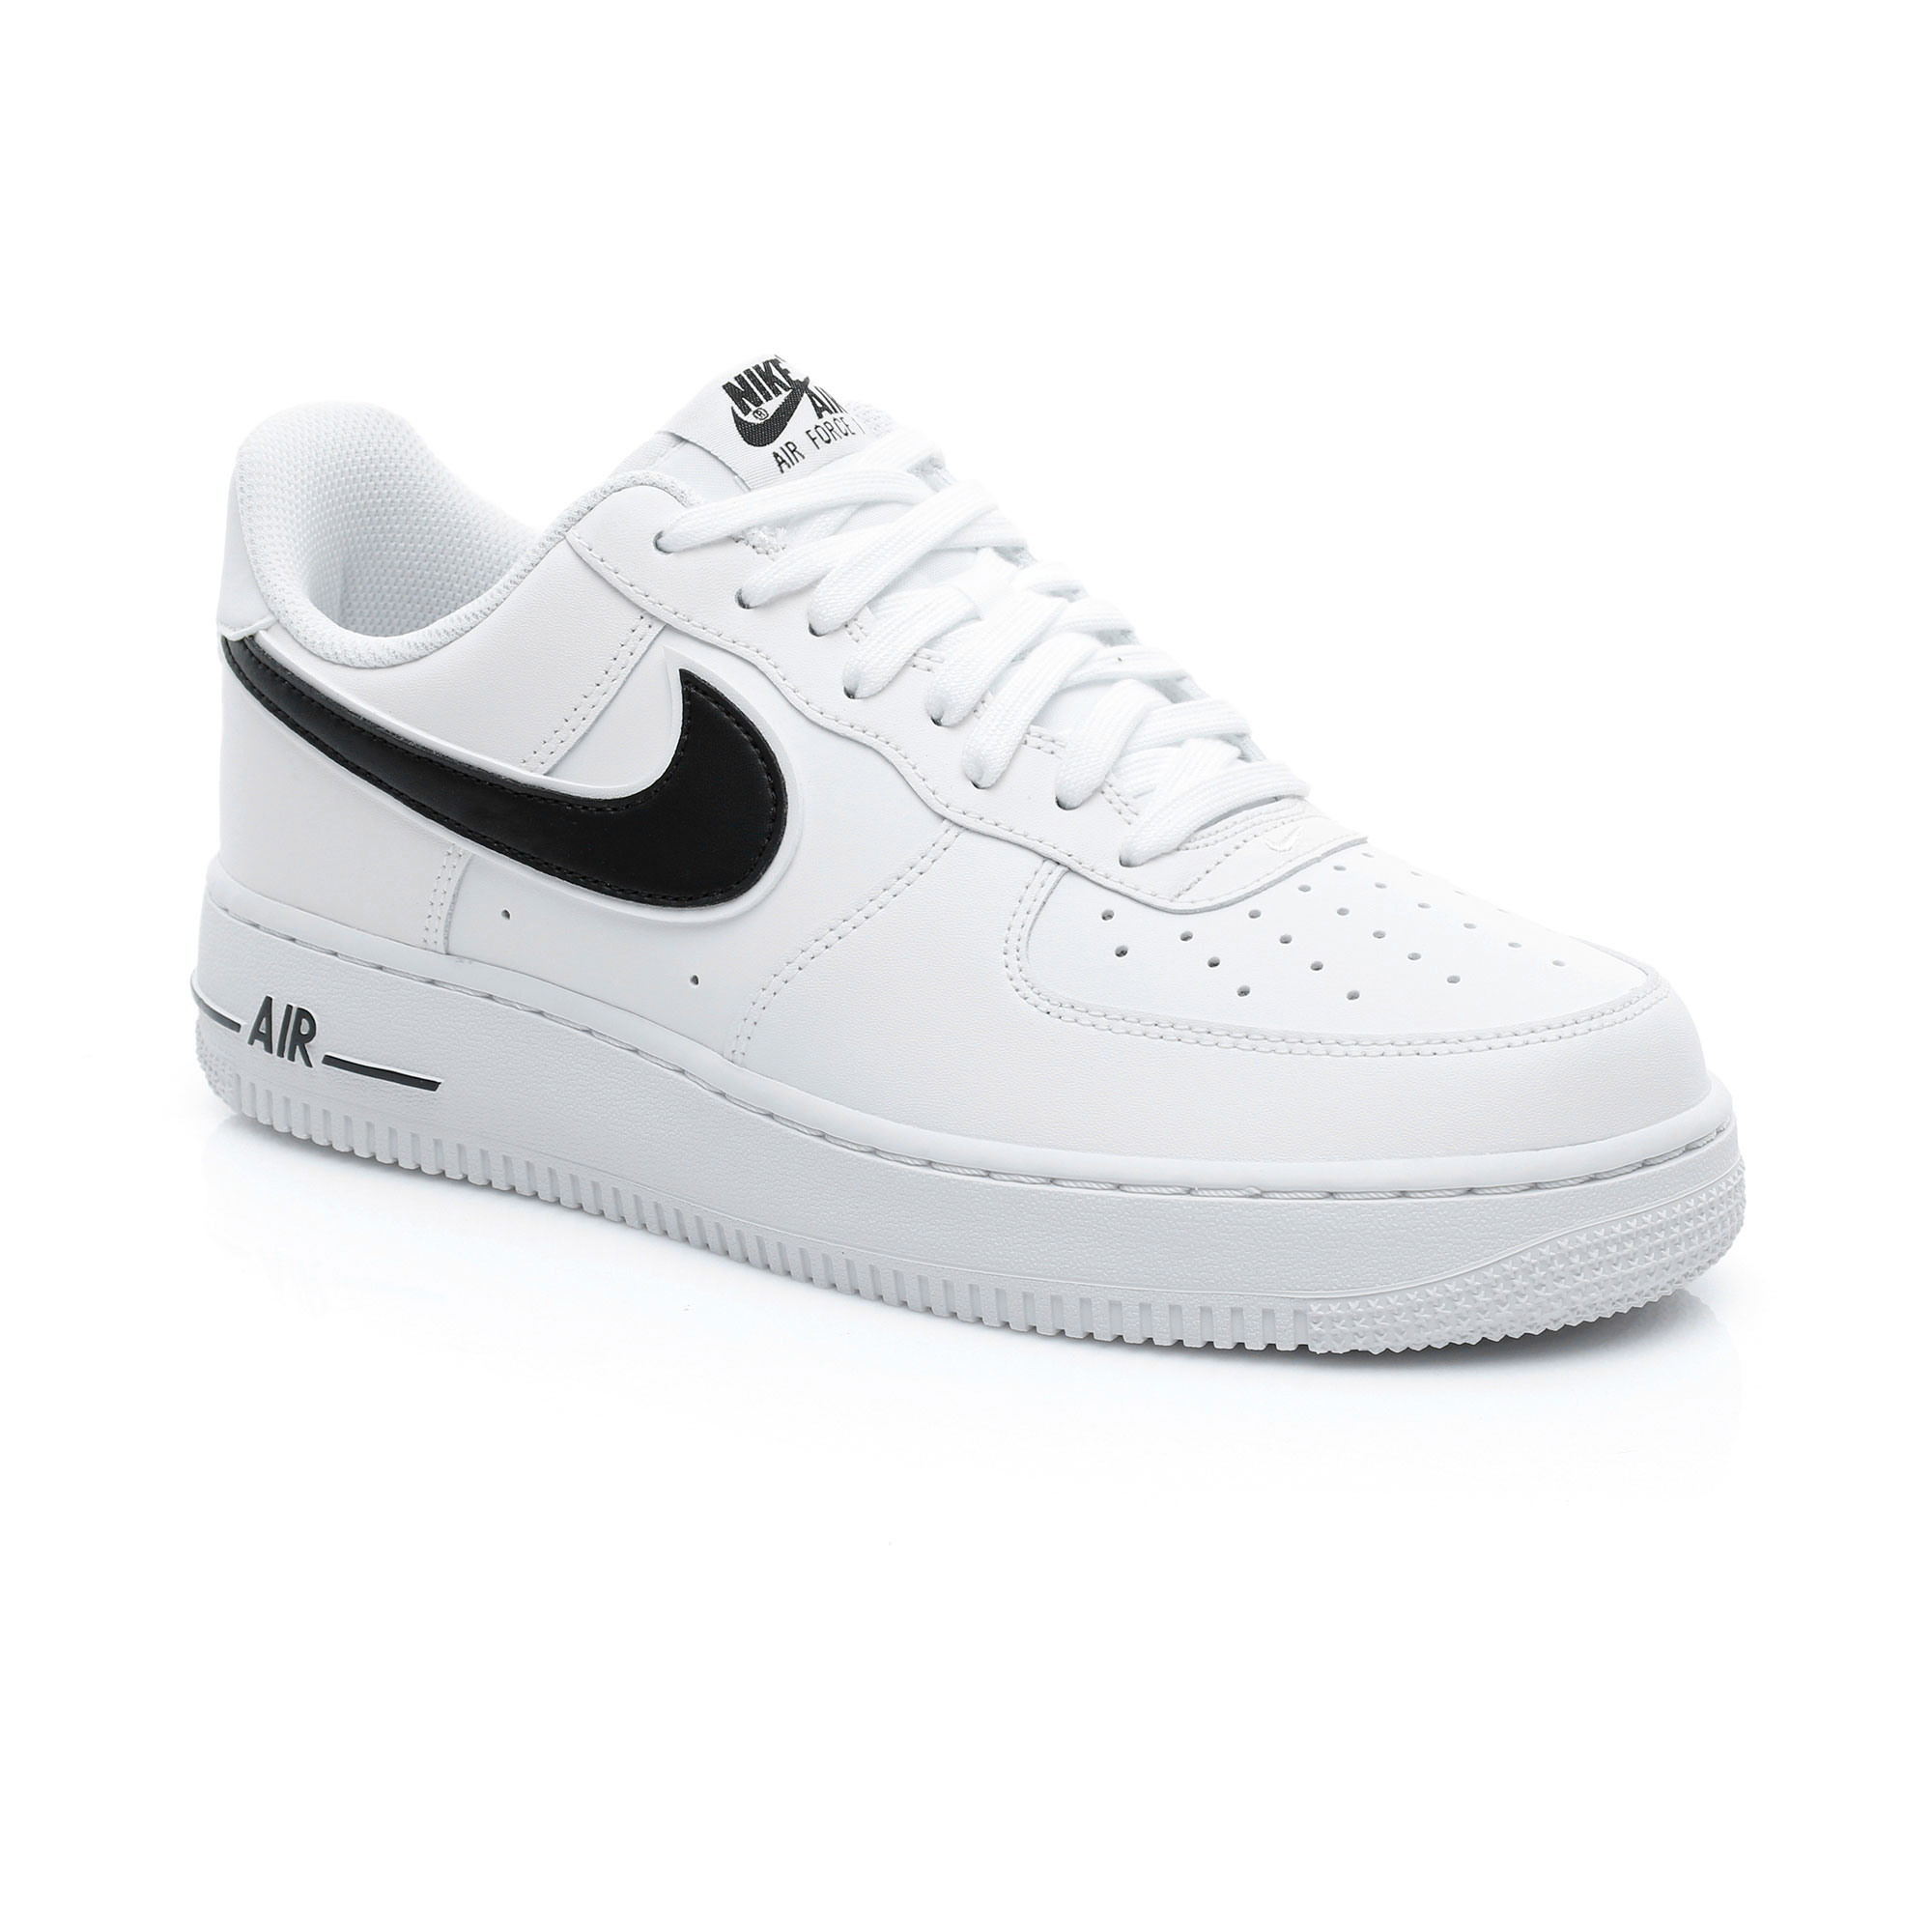 Cereal Integrar tema  Nike Air Force 1 '07 3 Erkek Beyaz Spor Ayakkabı AO2423 | Occasion